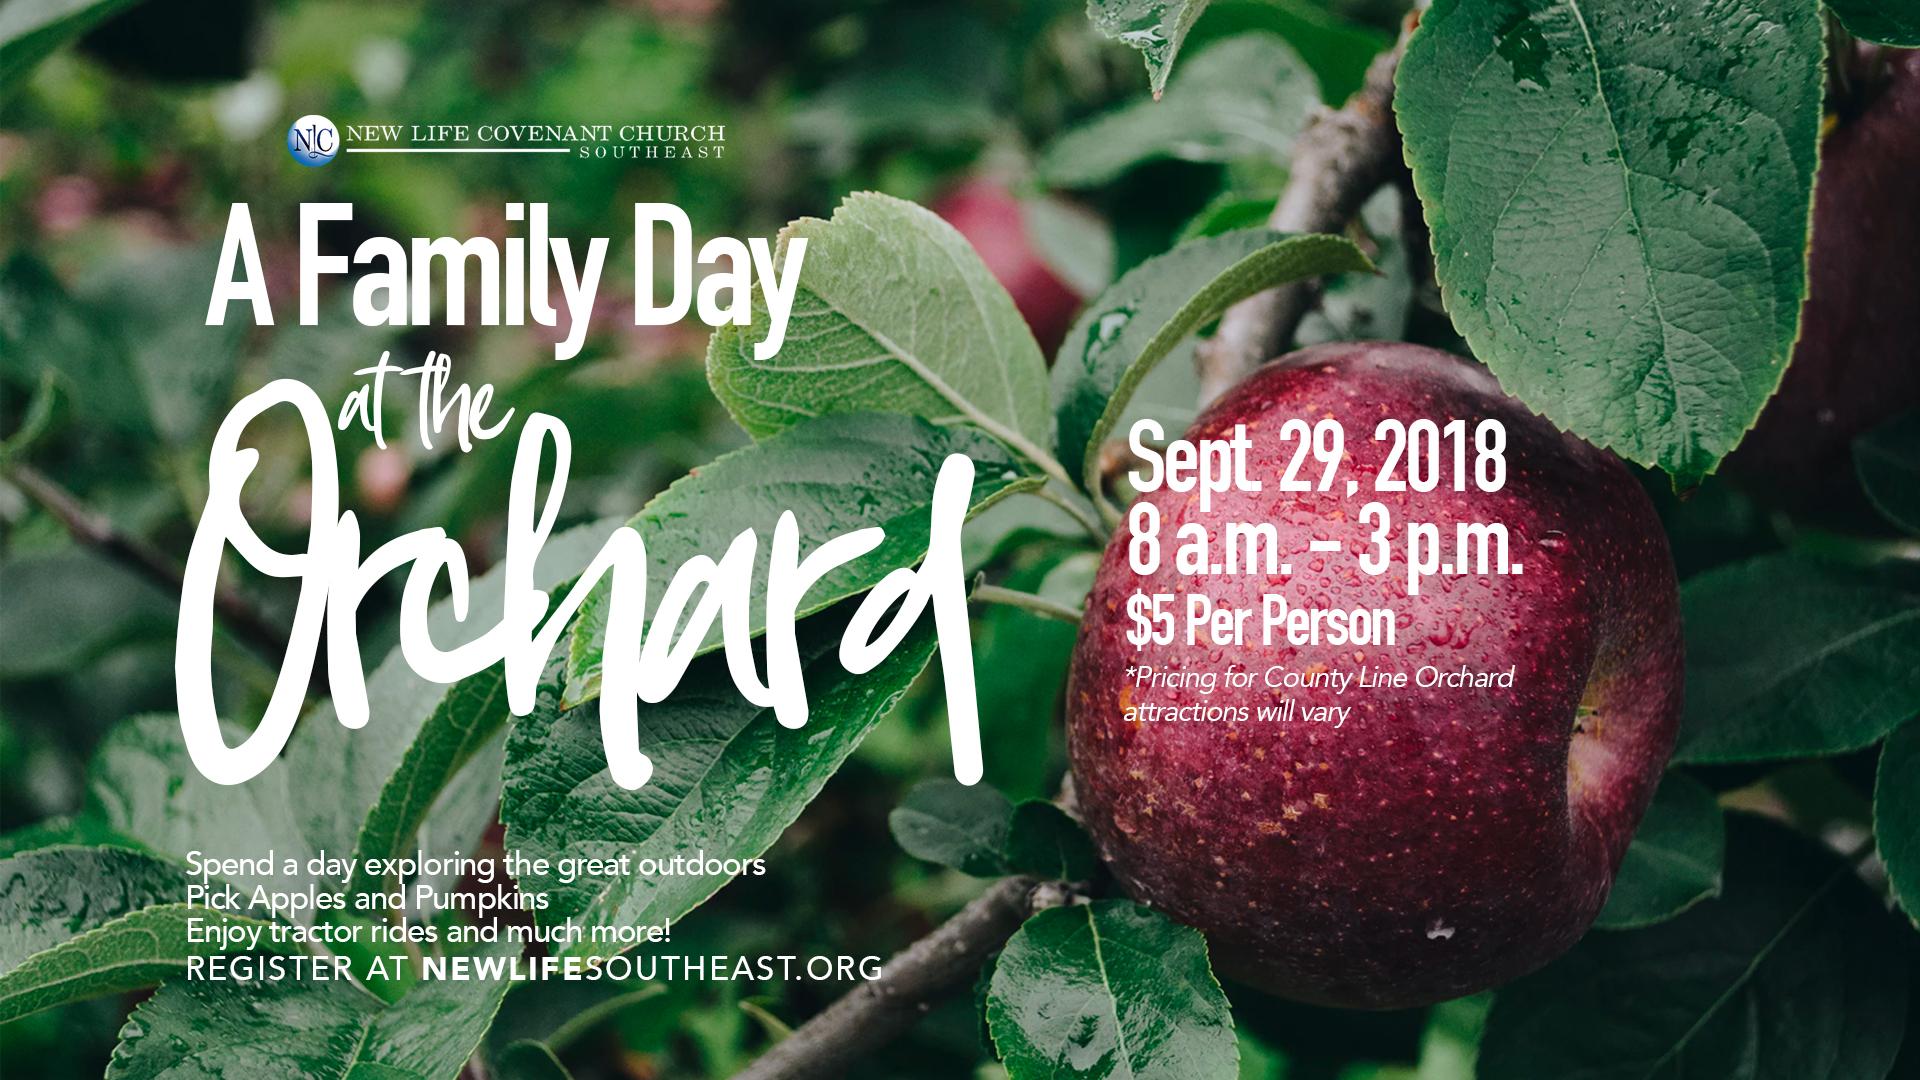 FinalOrchard Family Day Flyer (Web).jpg